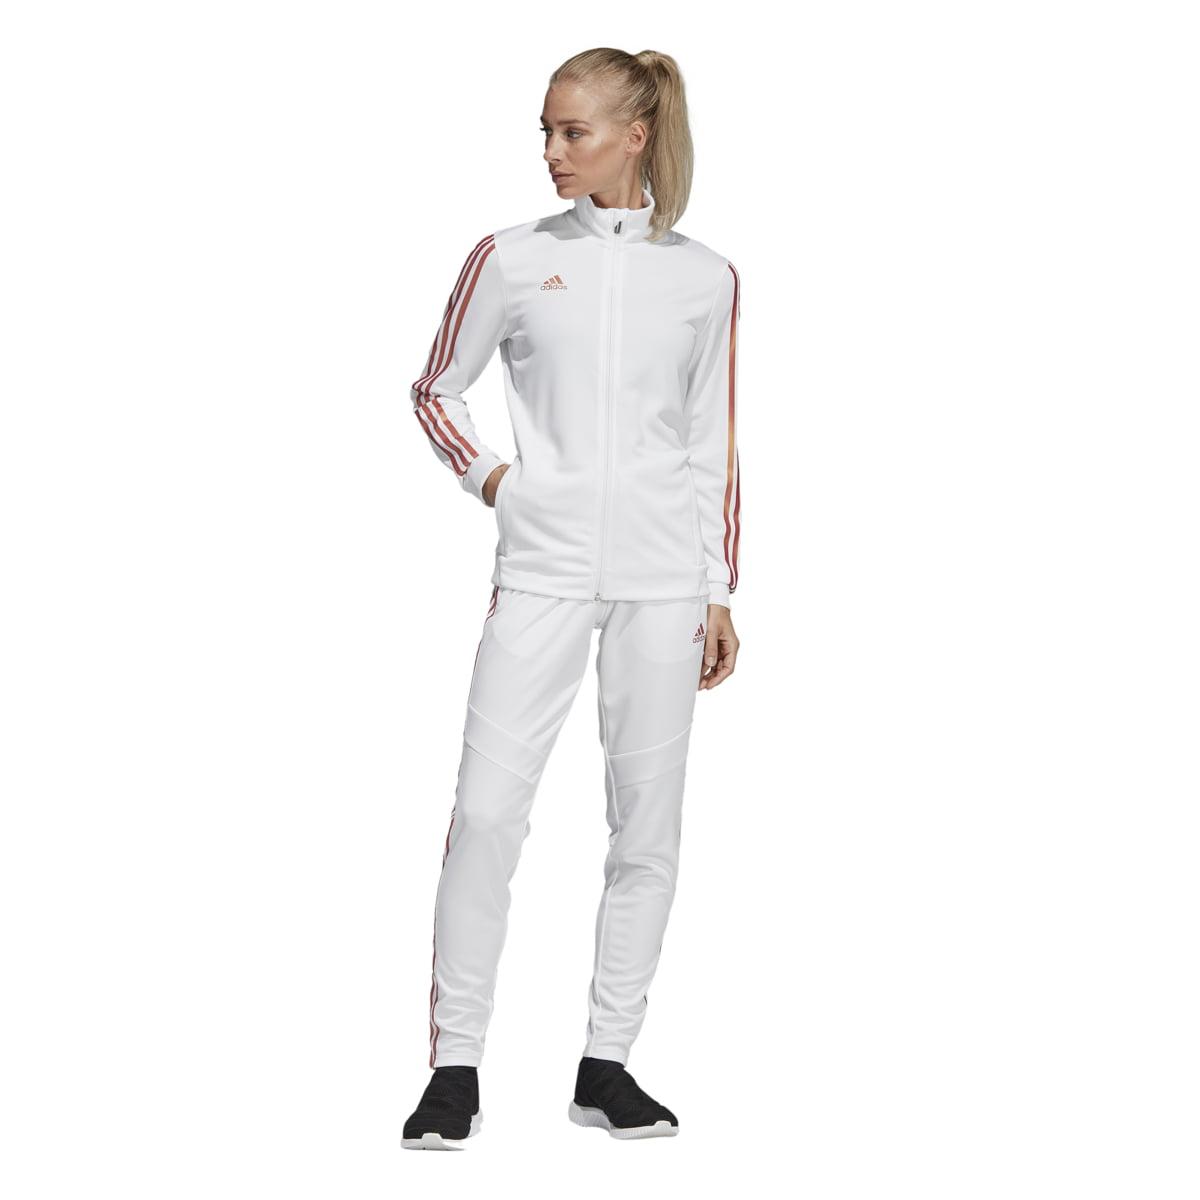 4d66421d5 Adidas Alphaskin Tiro Training Jacket White/Nude Pearl Essence Xx-Small -  Walmart.com